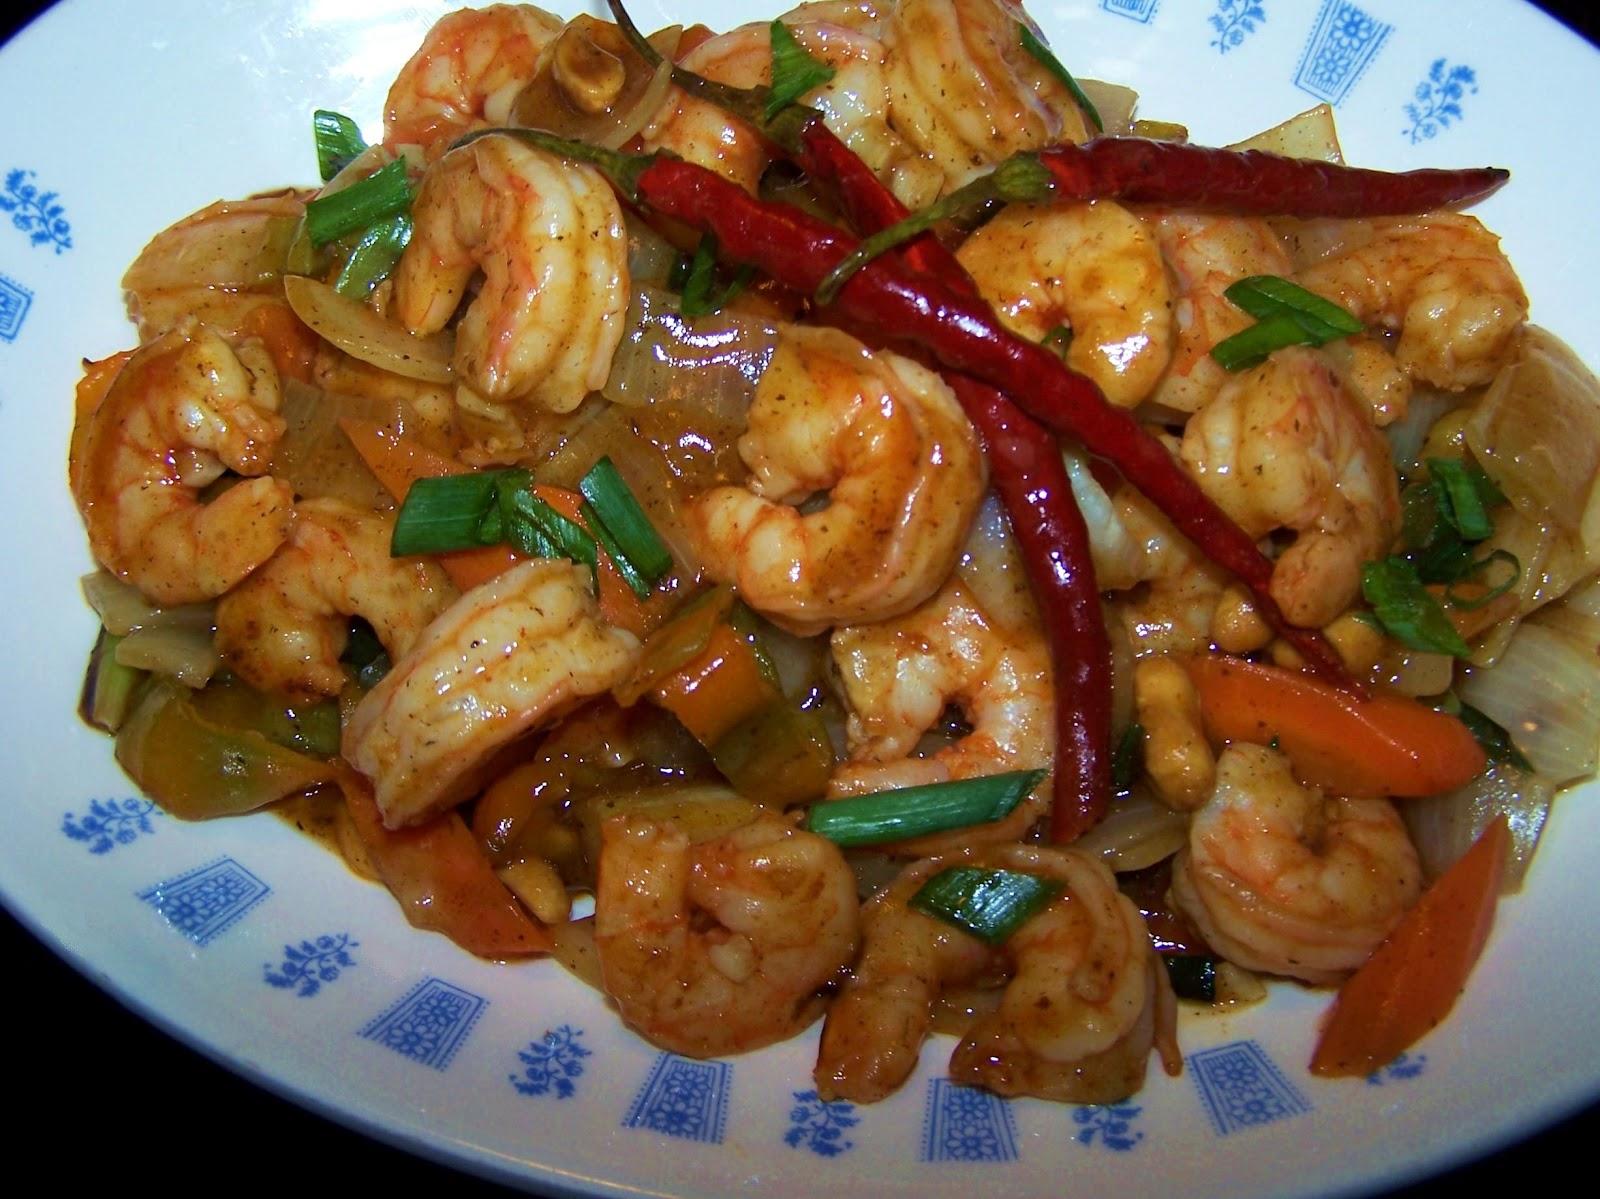 EZ Gluten Free: Kung Pao Shrimp - PF Chang's Copycat